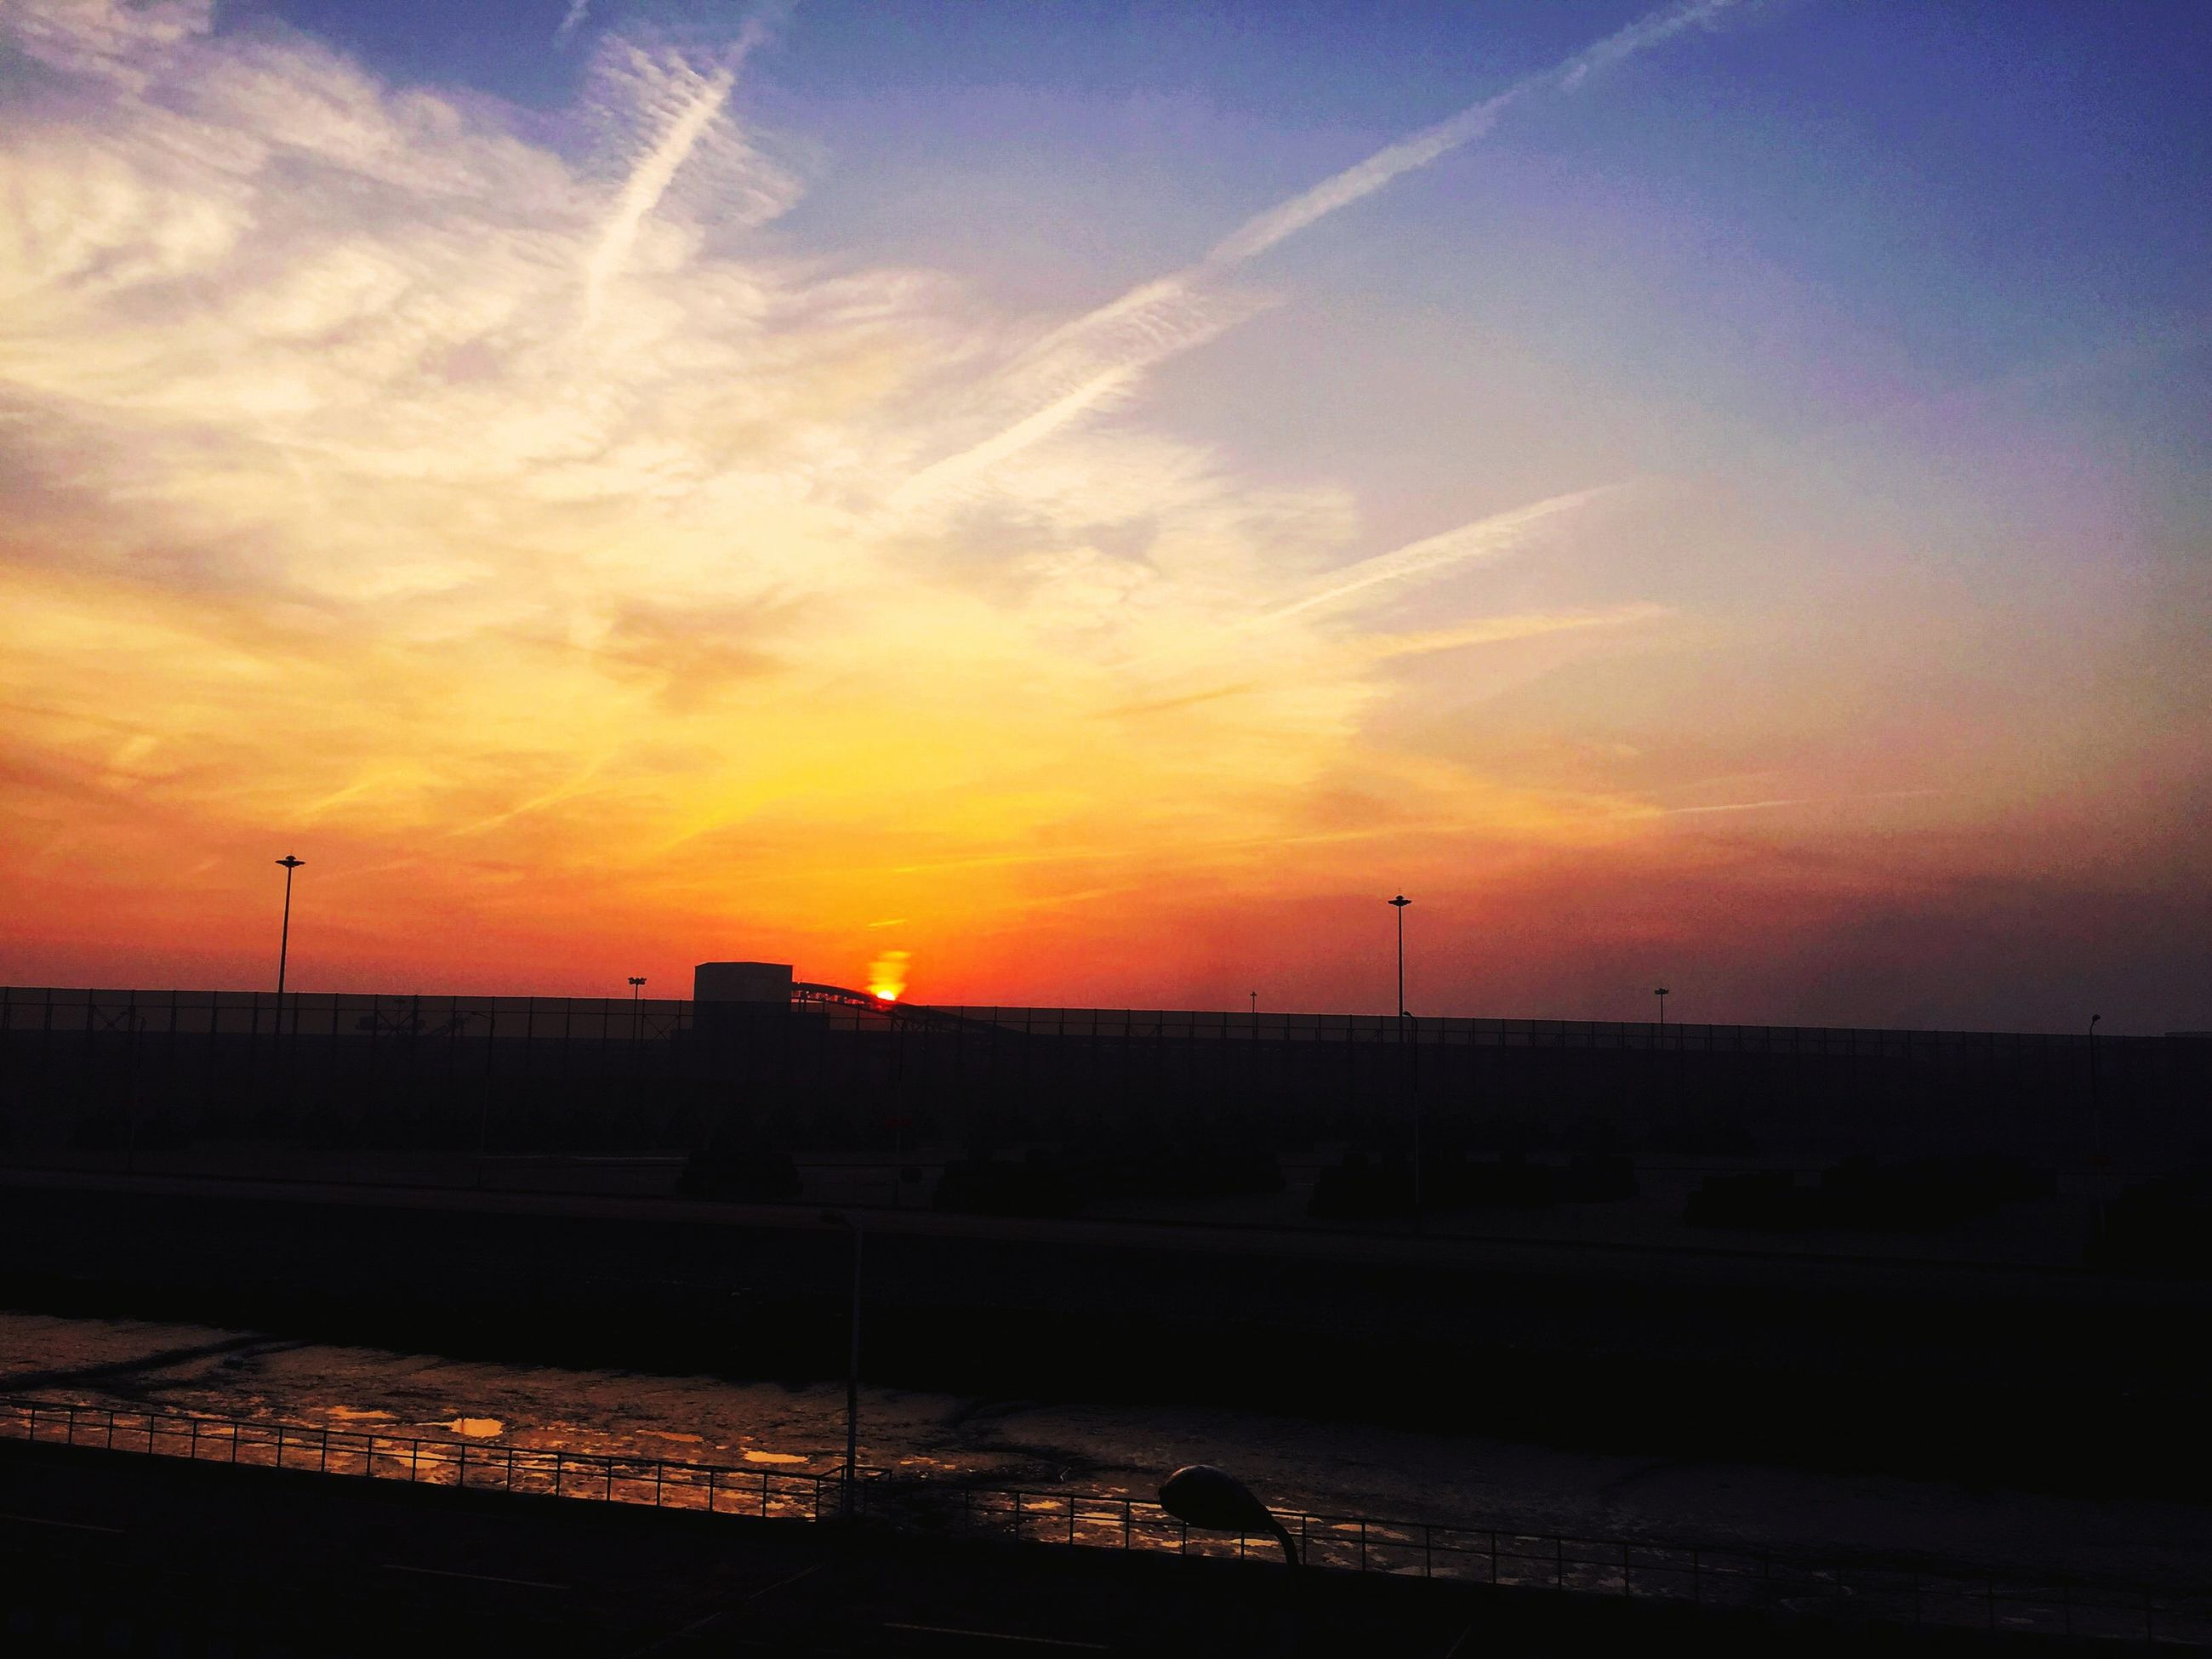 sunset, orange color, silhouette, sky, scenics, beauty in nature, sun, cloud - sky, tranquil scene, tranquility, nature, idyllic, landscape, dramatic sky, cloud, sunlight, outdoors, no people, moody sky, railing